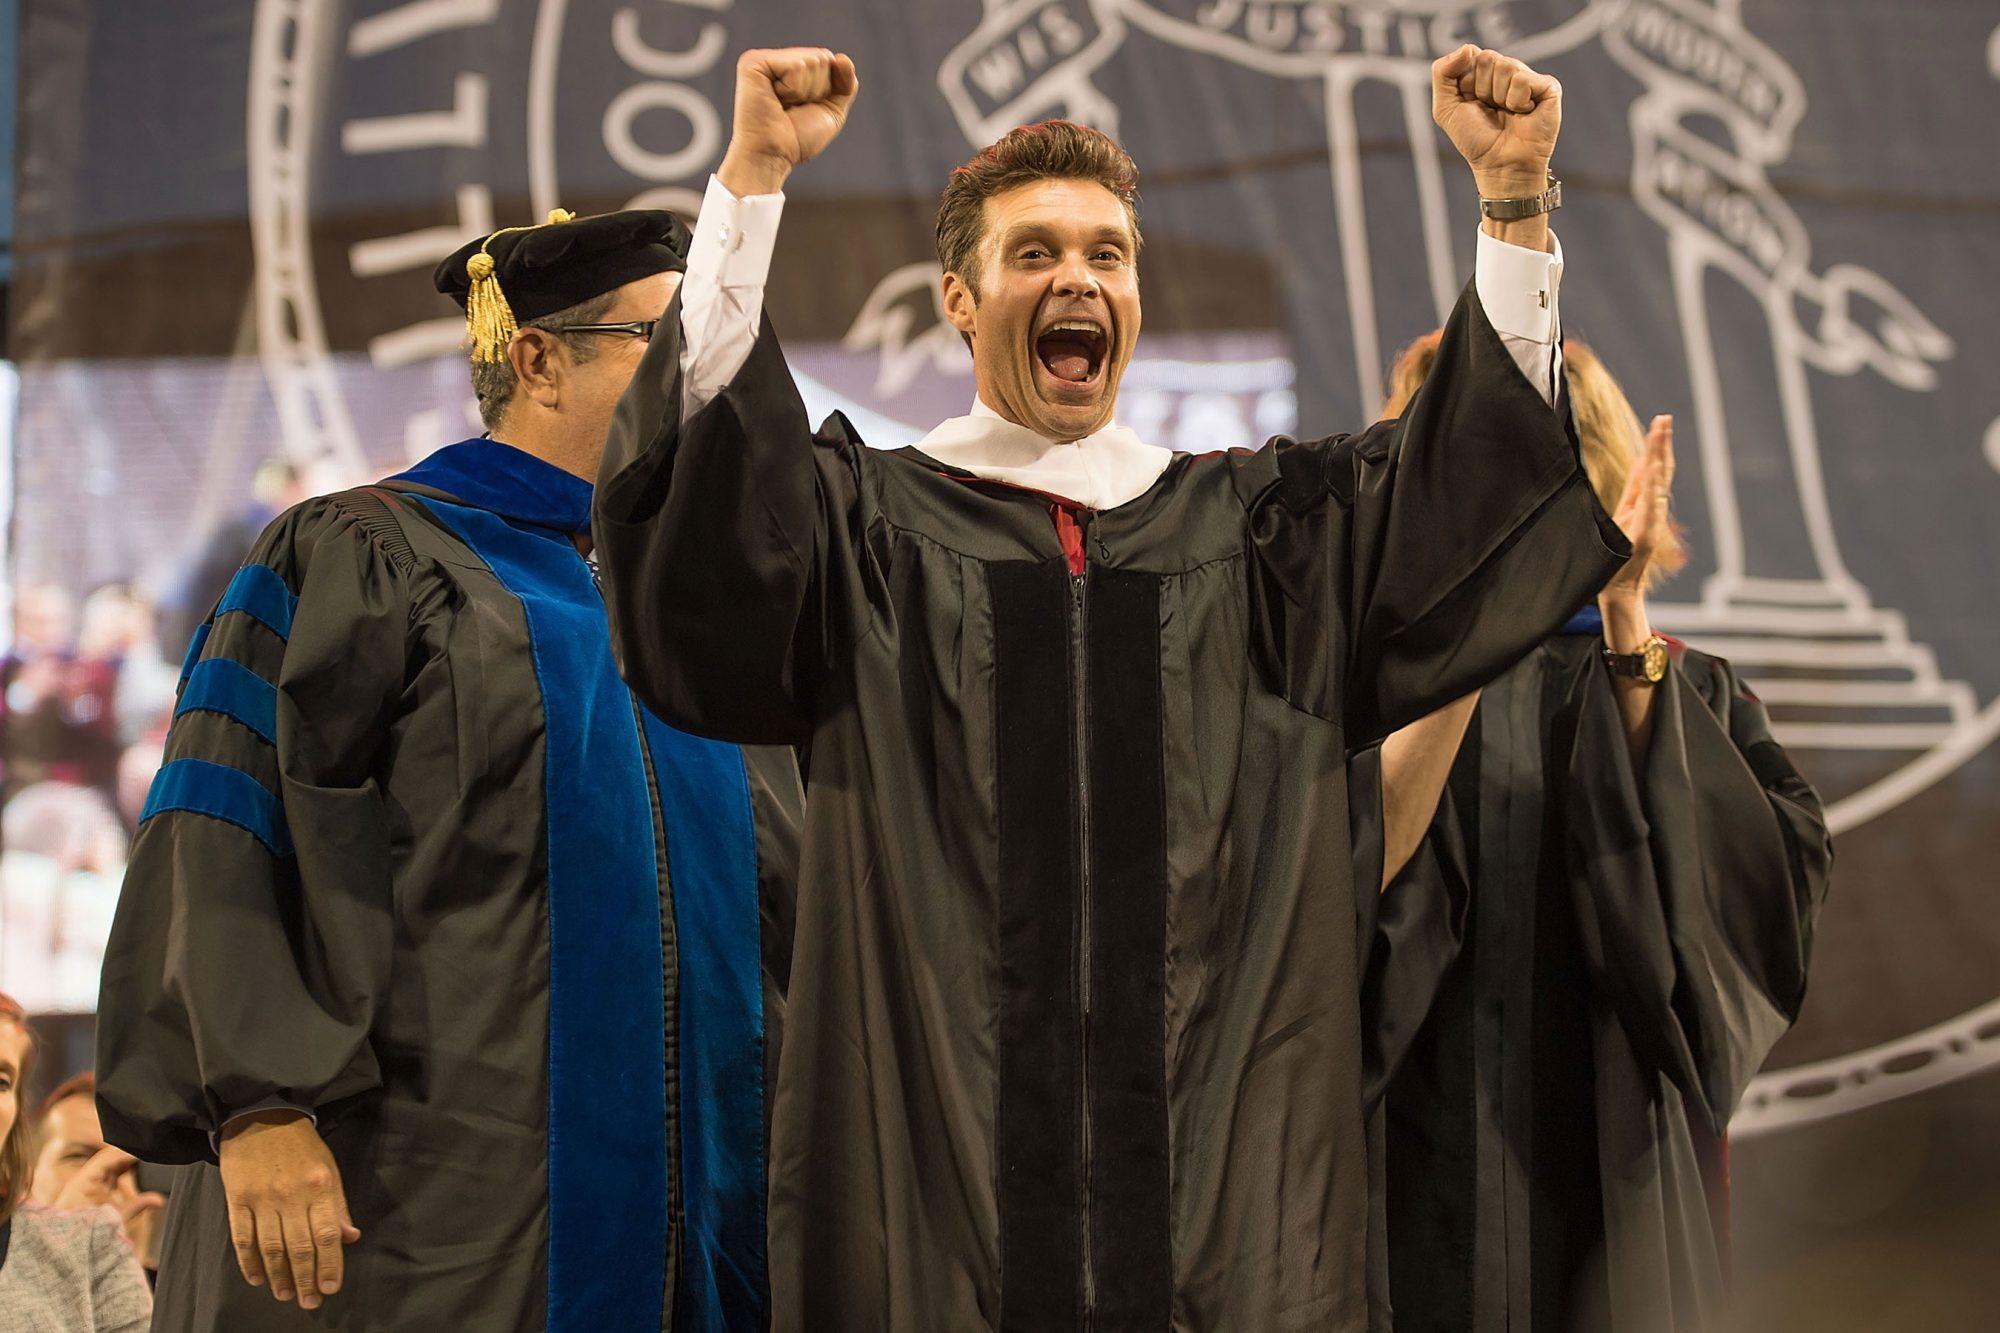 Ryan Seacrest Delivers University of Georgia Commencement Keynote Address